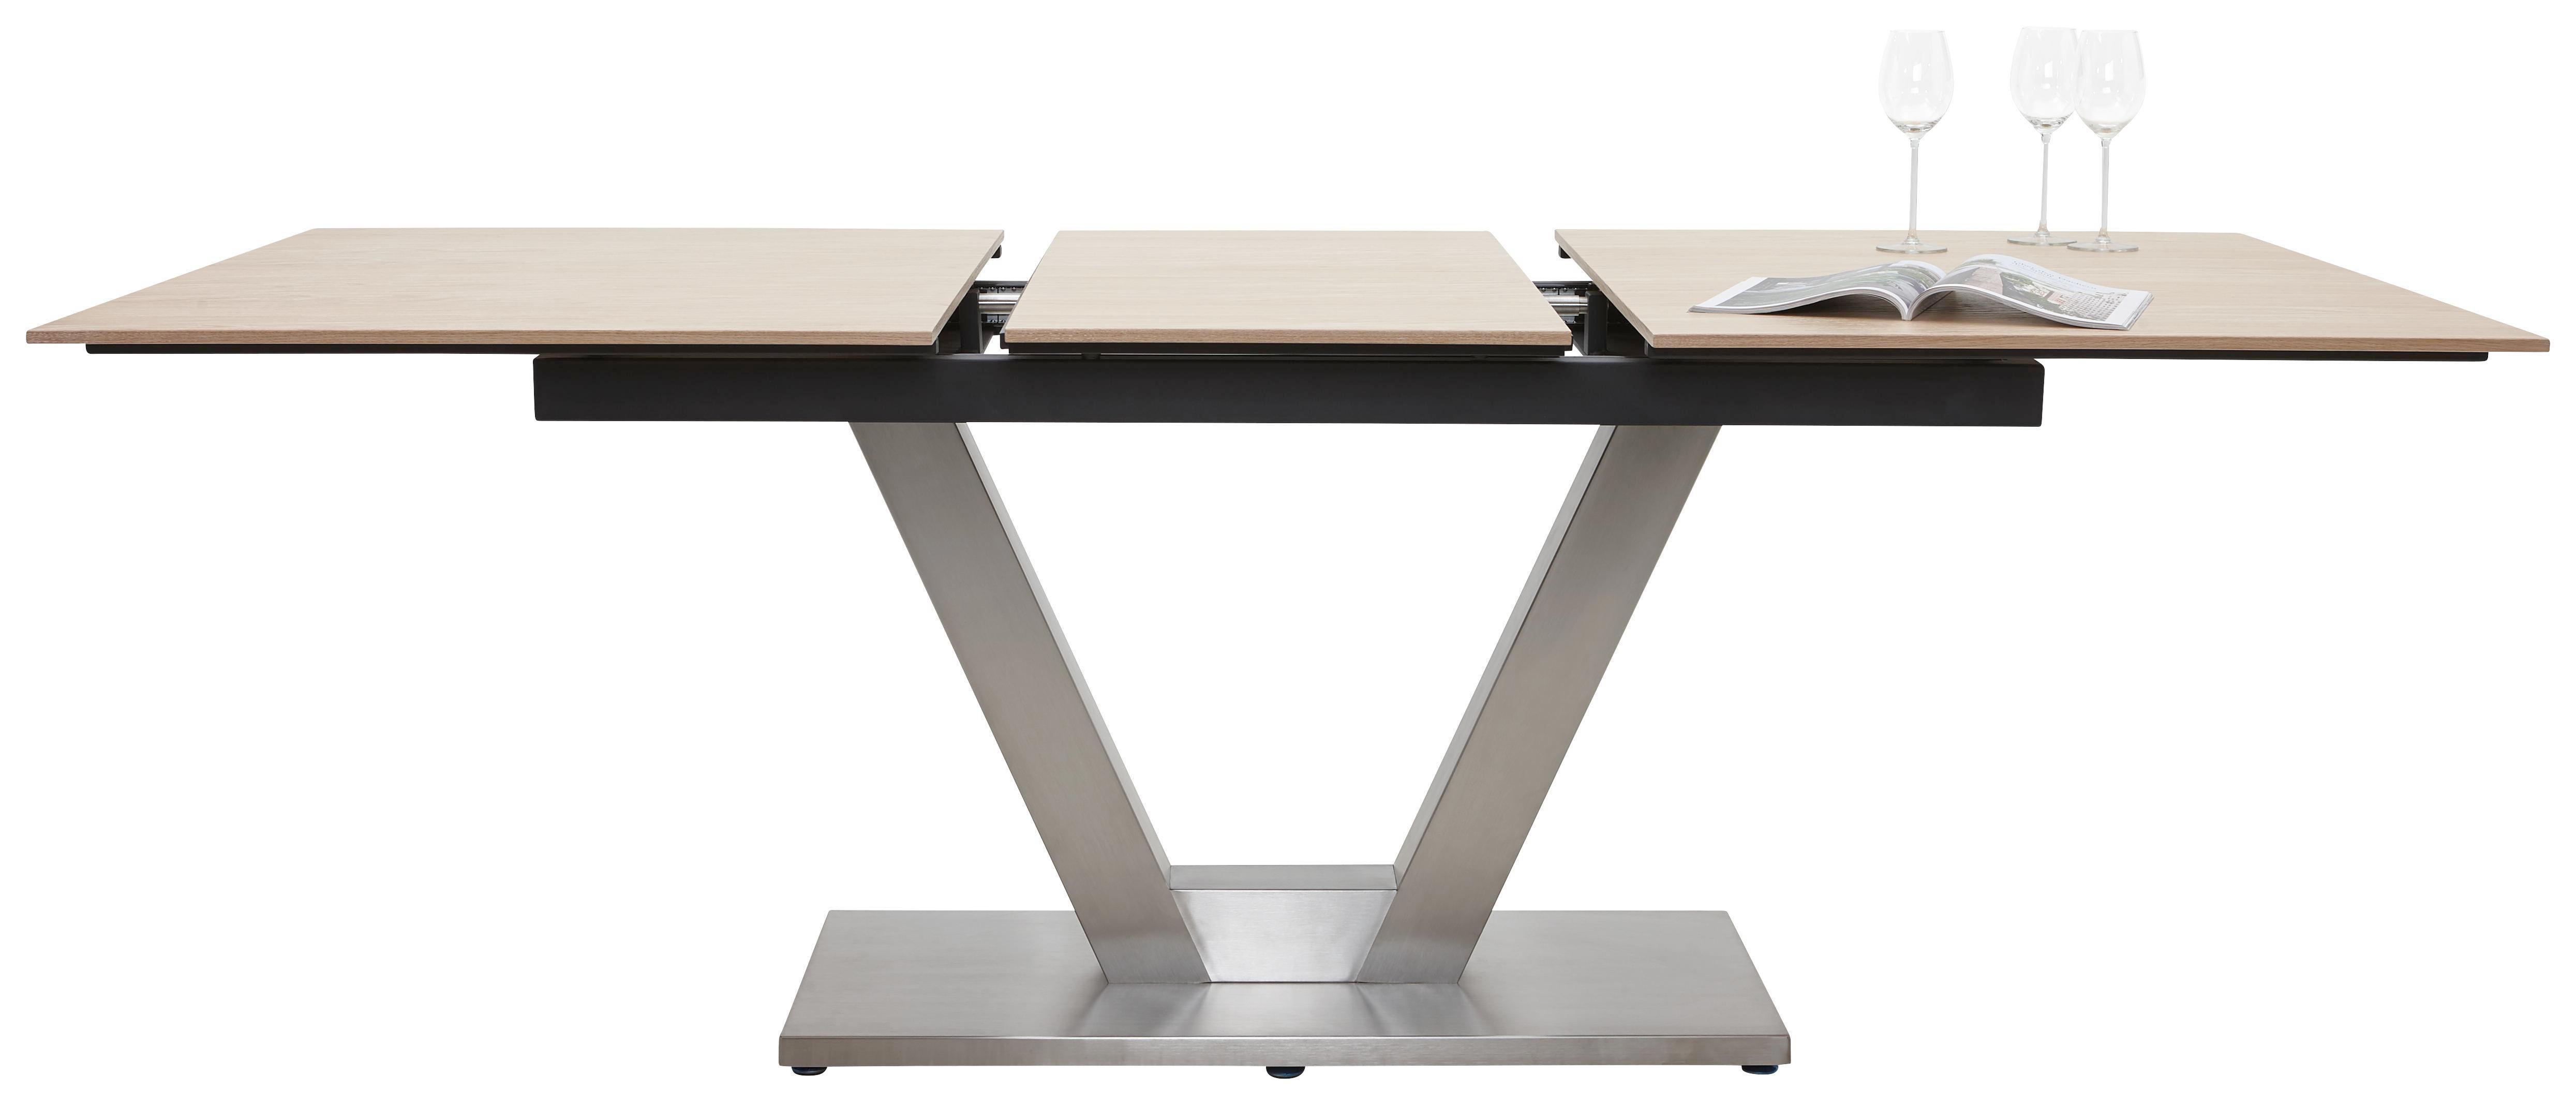 ESSTISCH Eiche furniert rechteckig Edelstahlfarben, Eichefarben - Edelstahlfarben/Eichefarben, Design, Holz/Metall (160(210)/100/77cm) - DIETER KNOLL